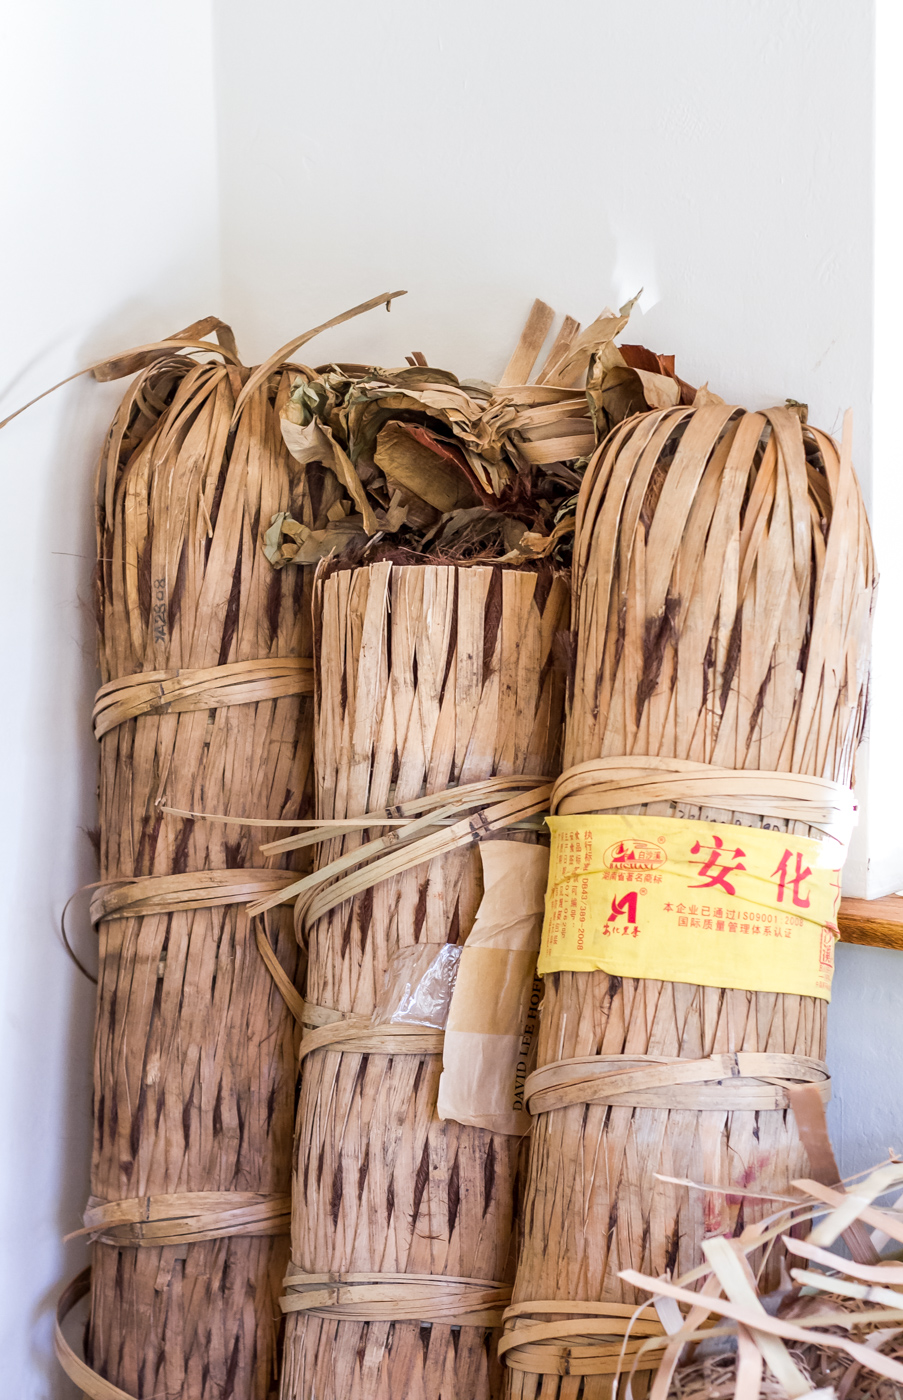 Heicha dark tea wrapped in bamboo